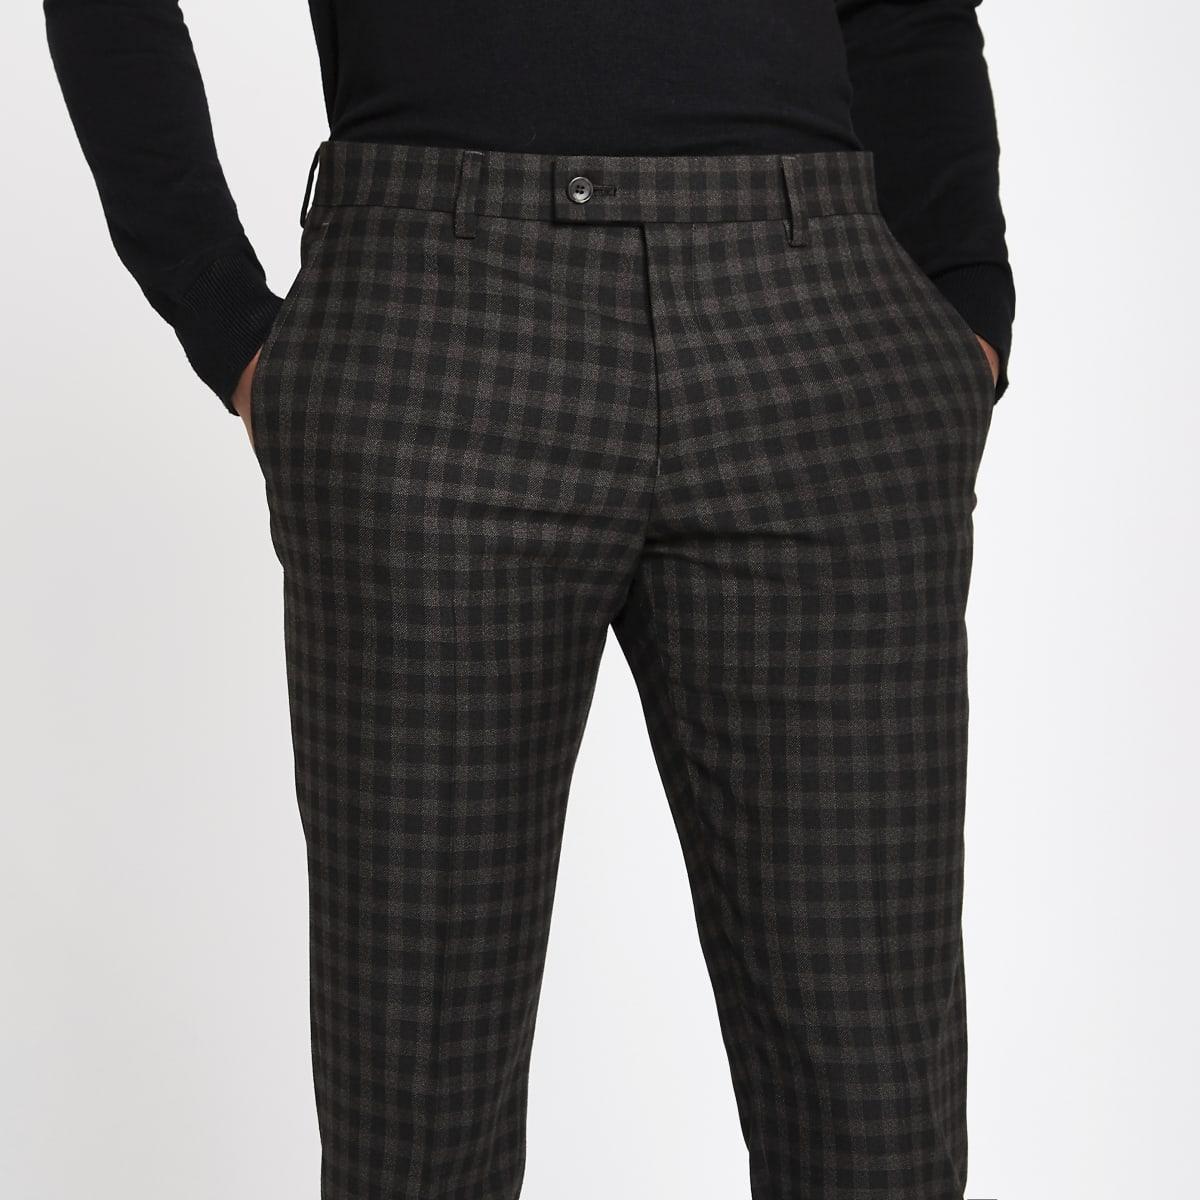 Brown shadow check skinny fit suit pants